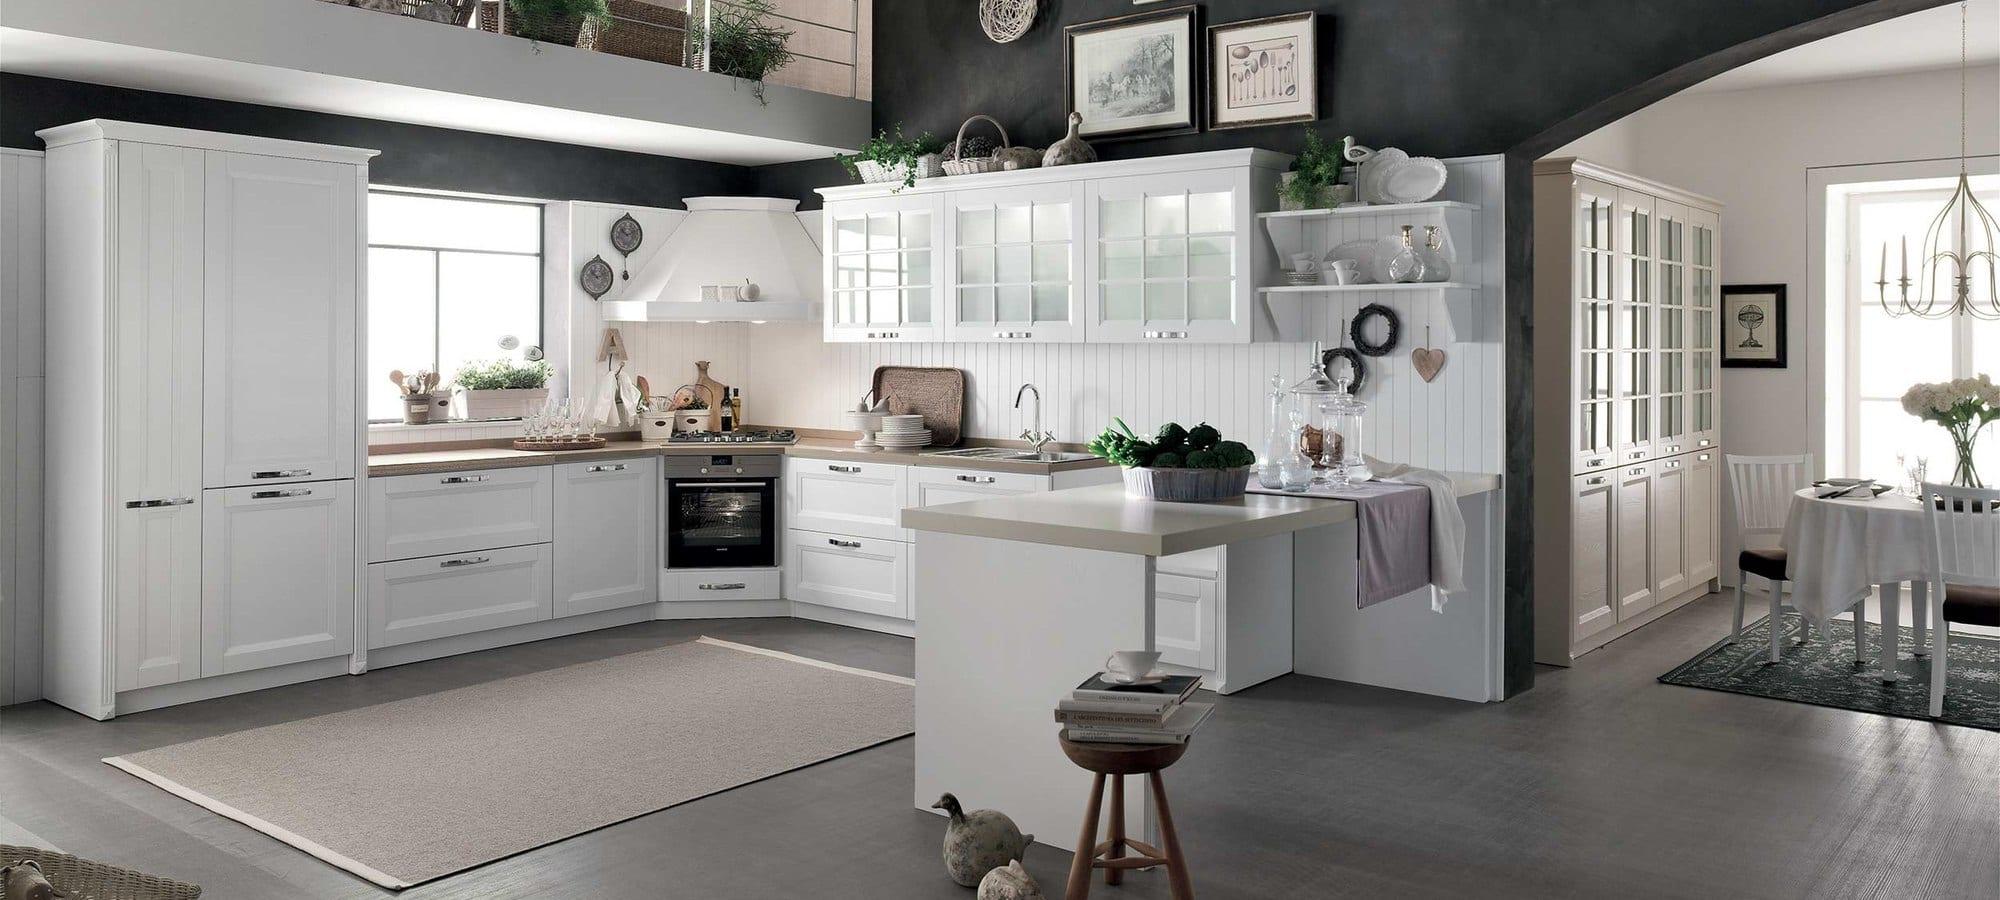 Cucina beverly raimondi idee casa for Stosa cucine verona